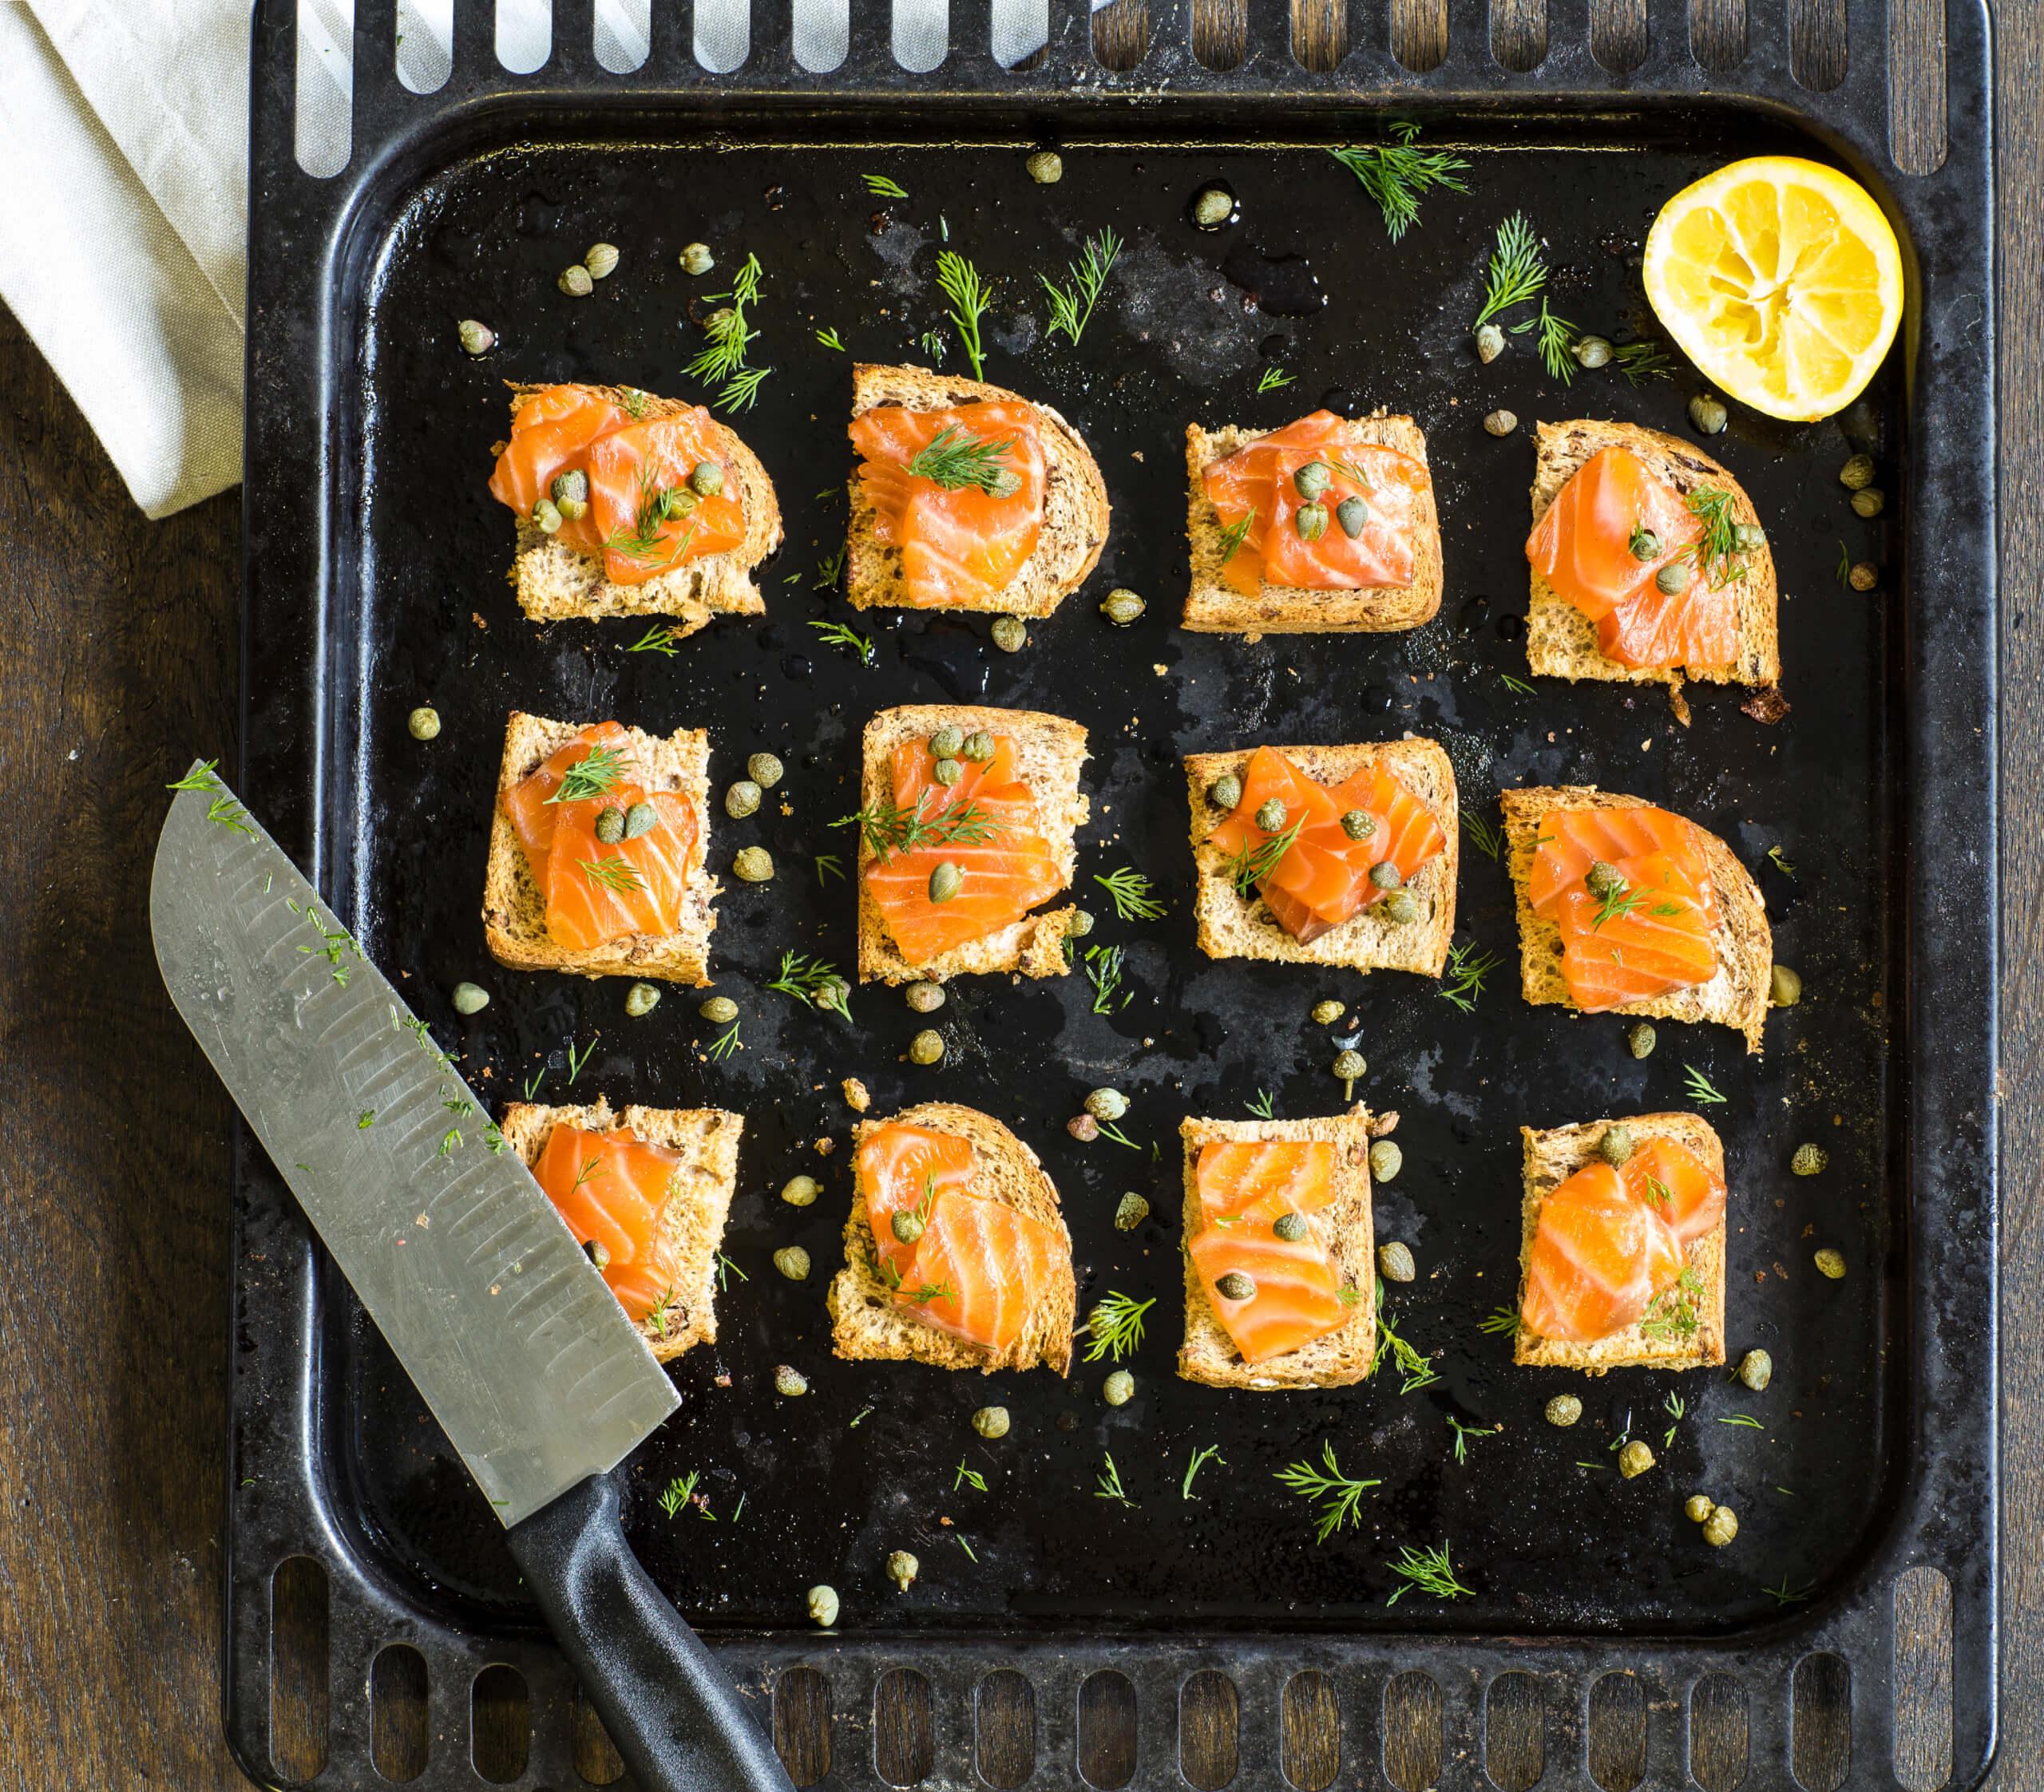 Nielsen-Massey's Vanilla Infused Salmon Fillets